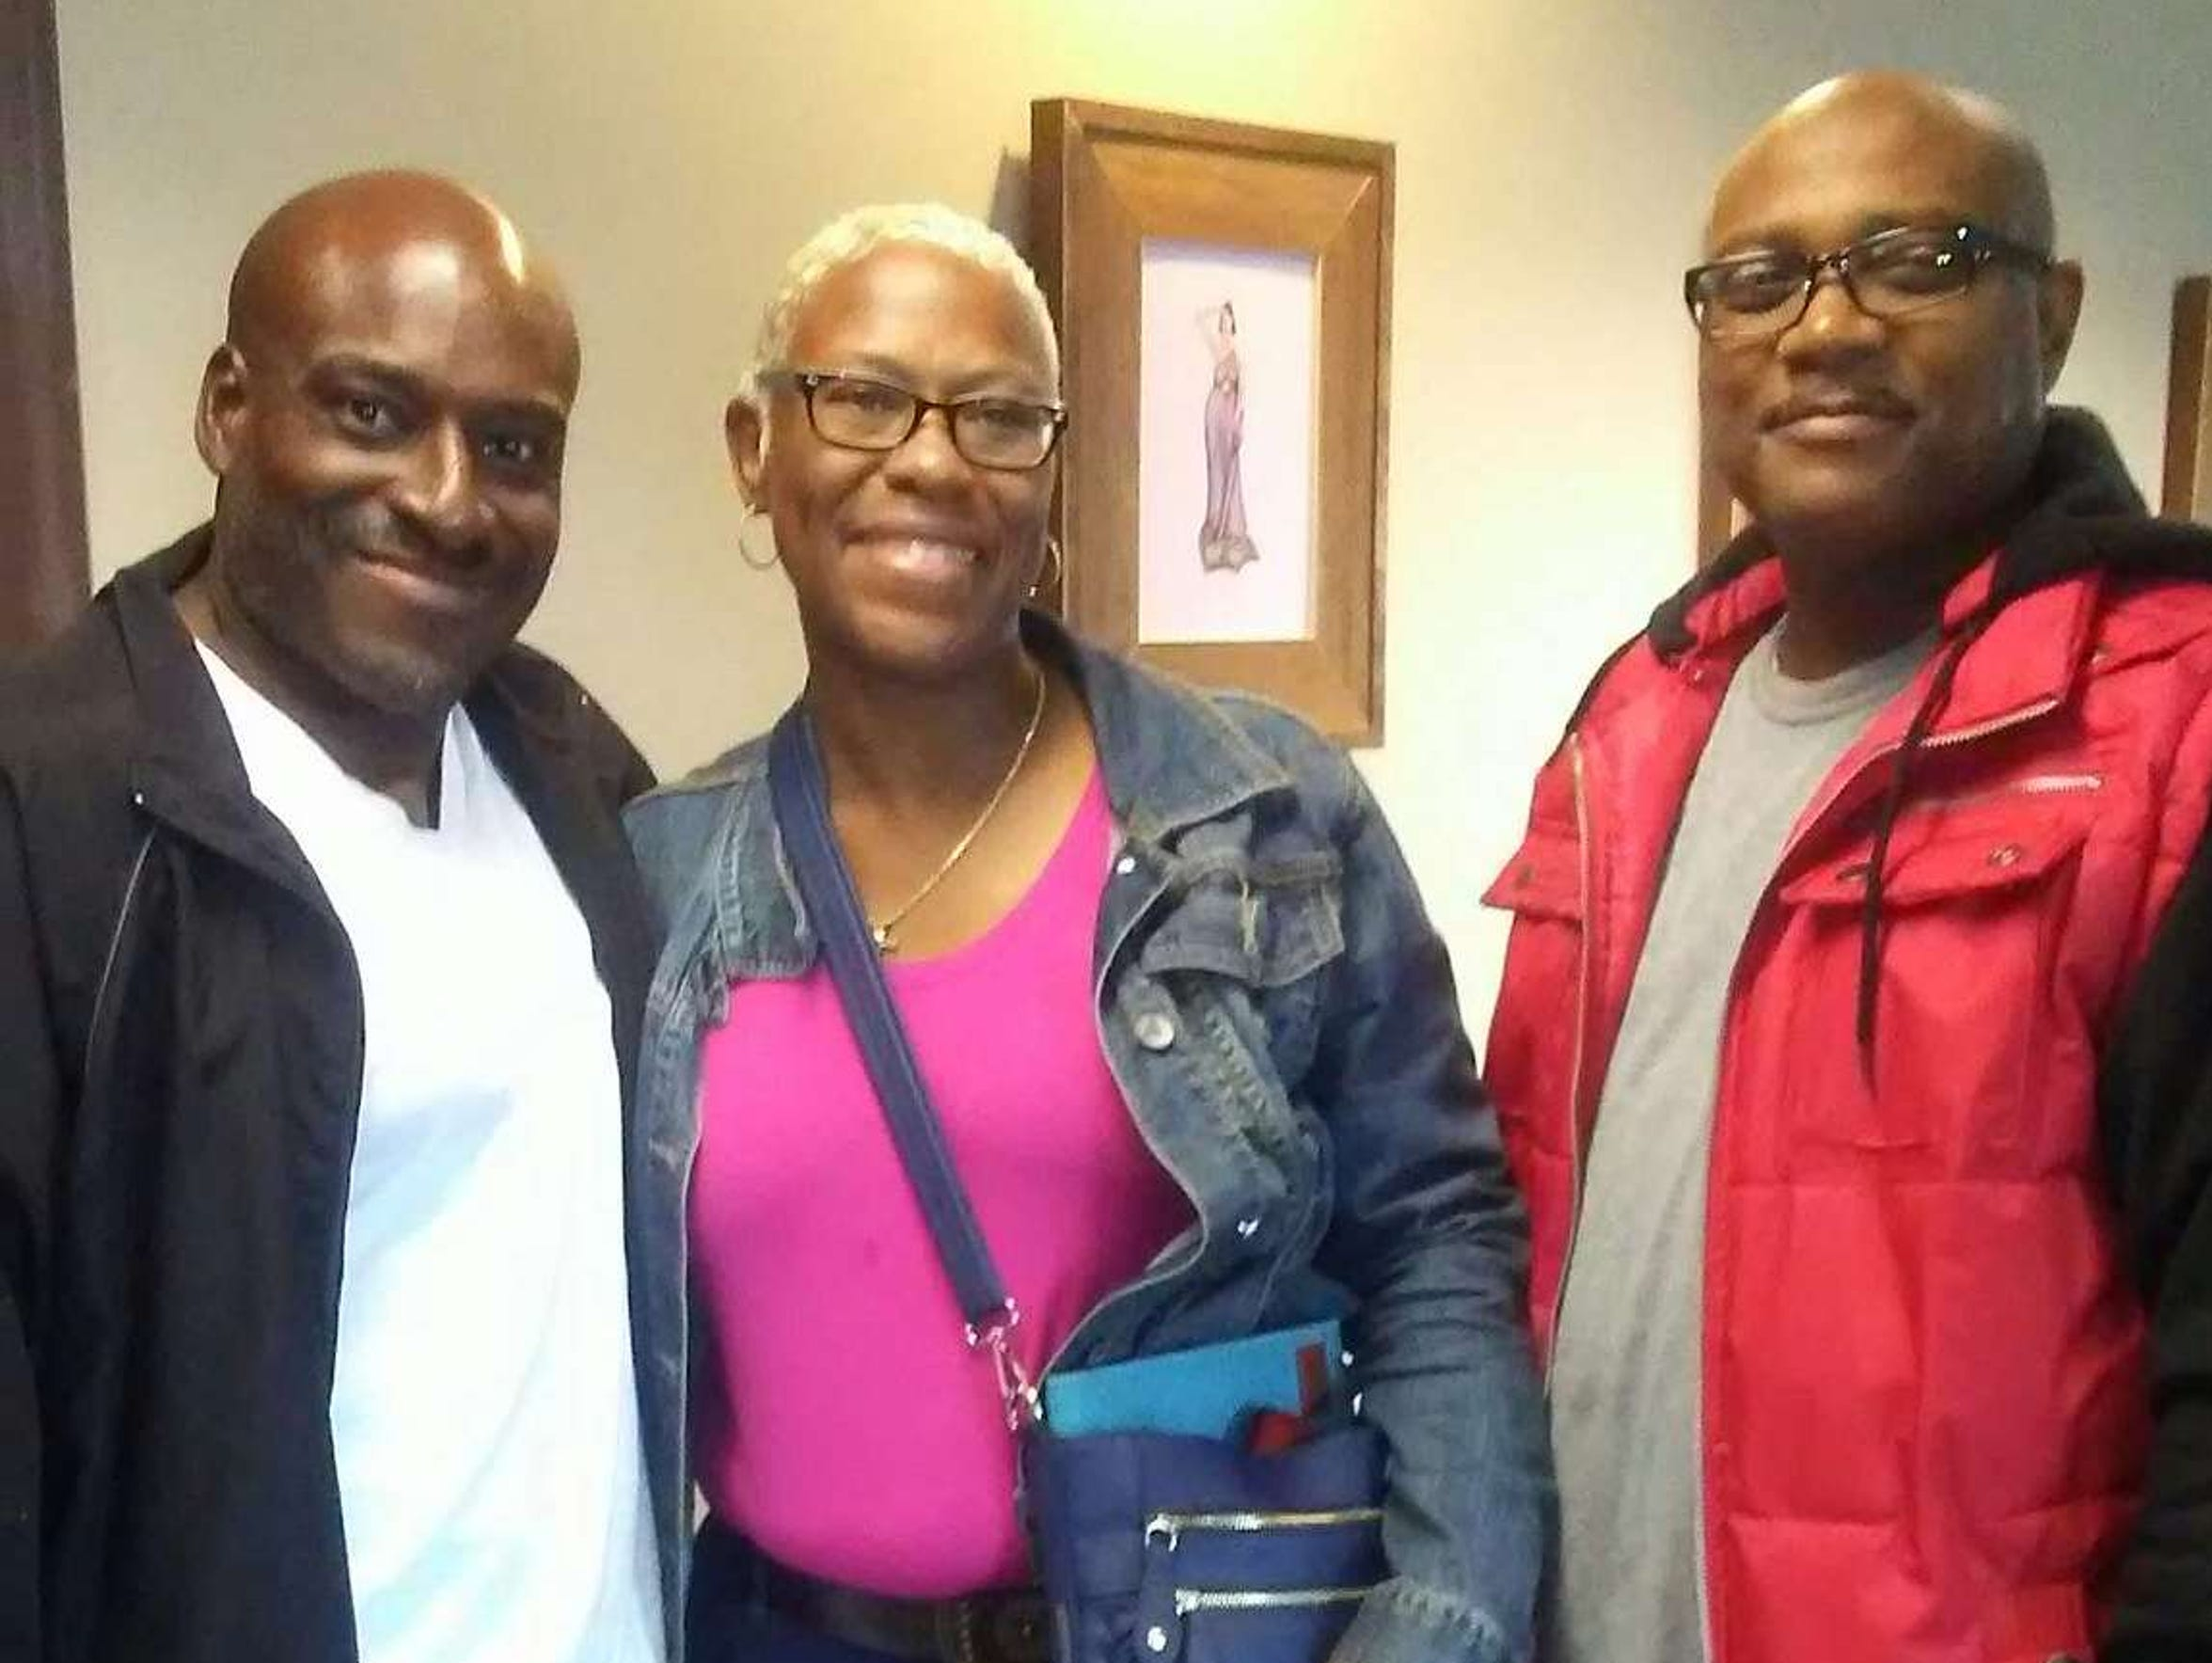 Bobby Hines, Valencia Warren-Gibbs and Michael Gibbs